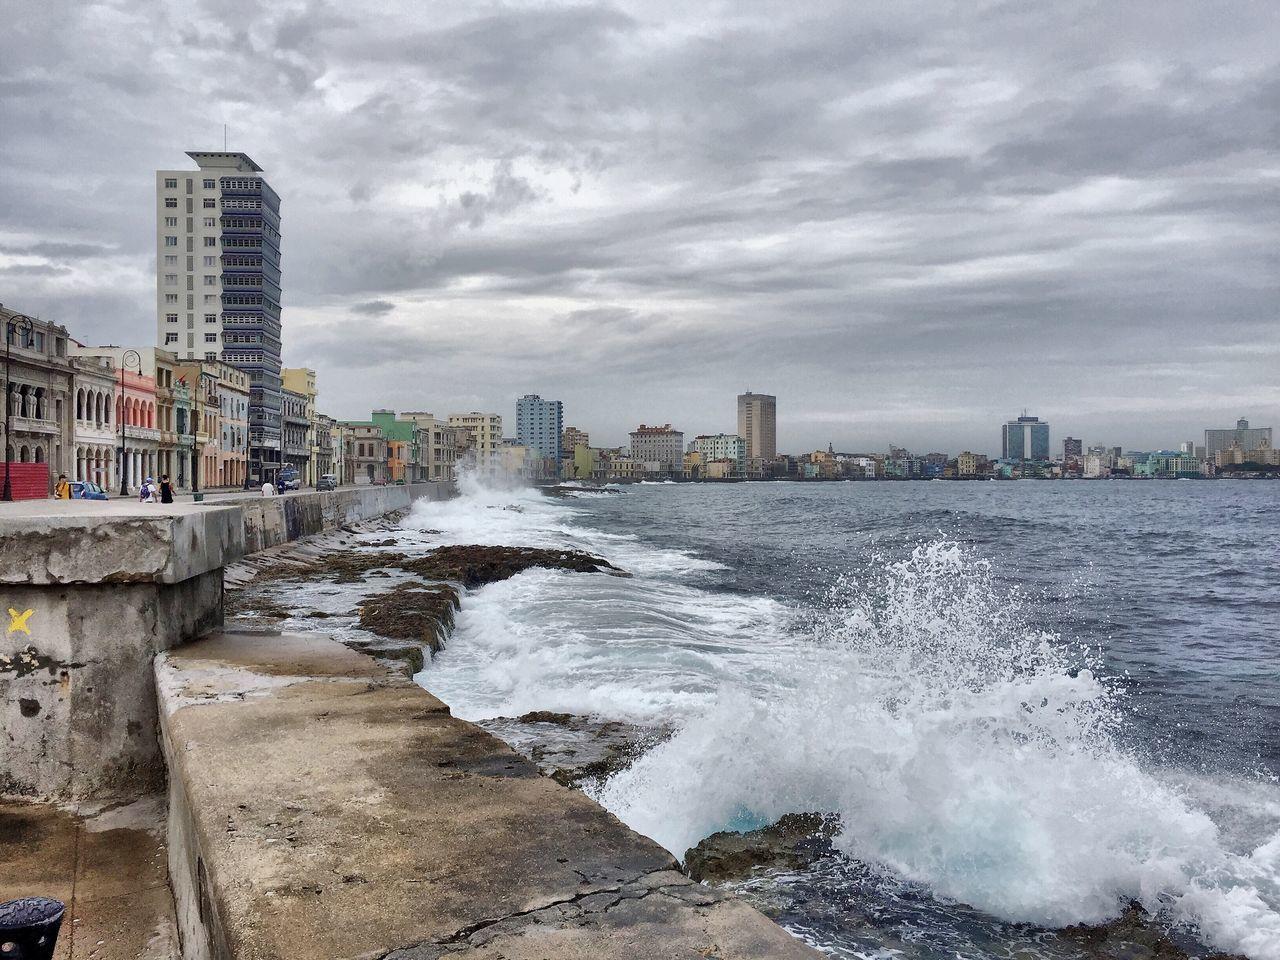 Waves Splashing Towards Retaining Wall Against Cloudy Sky